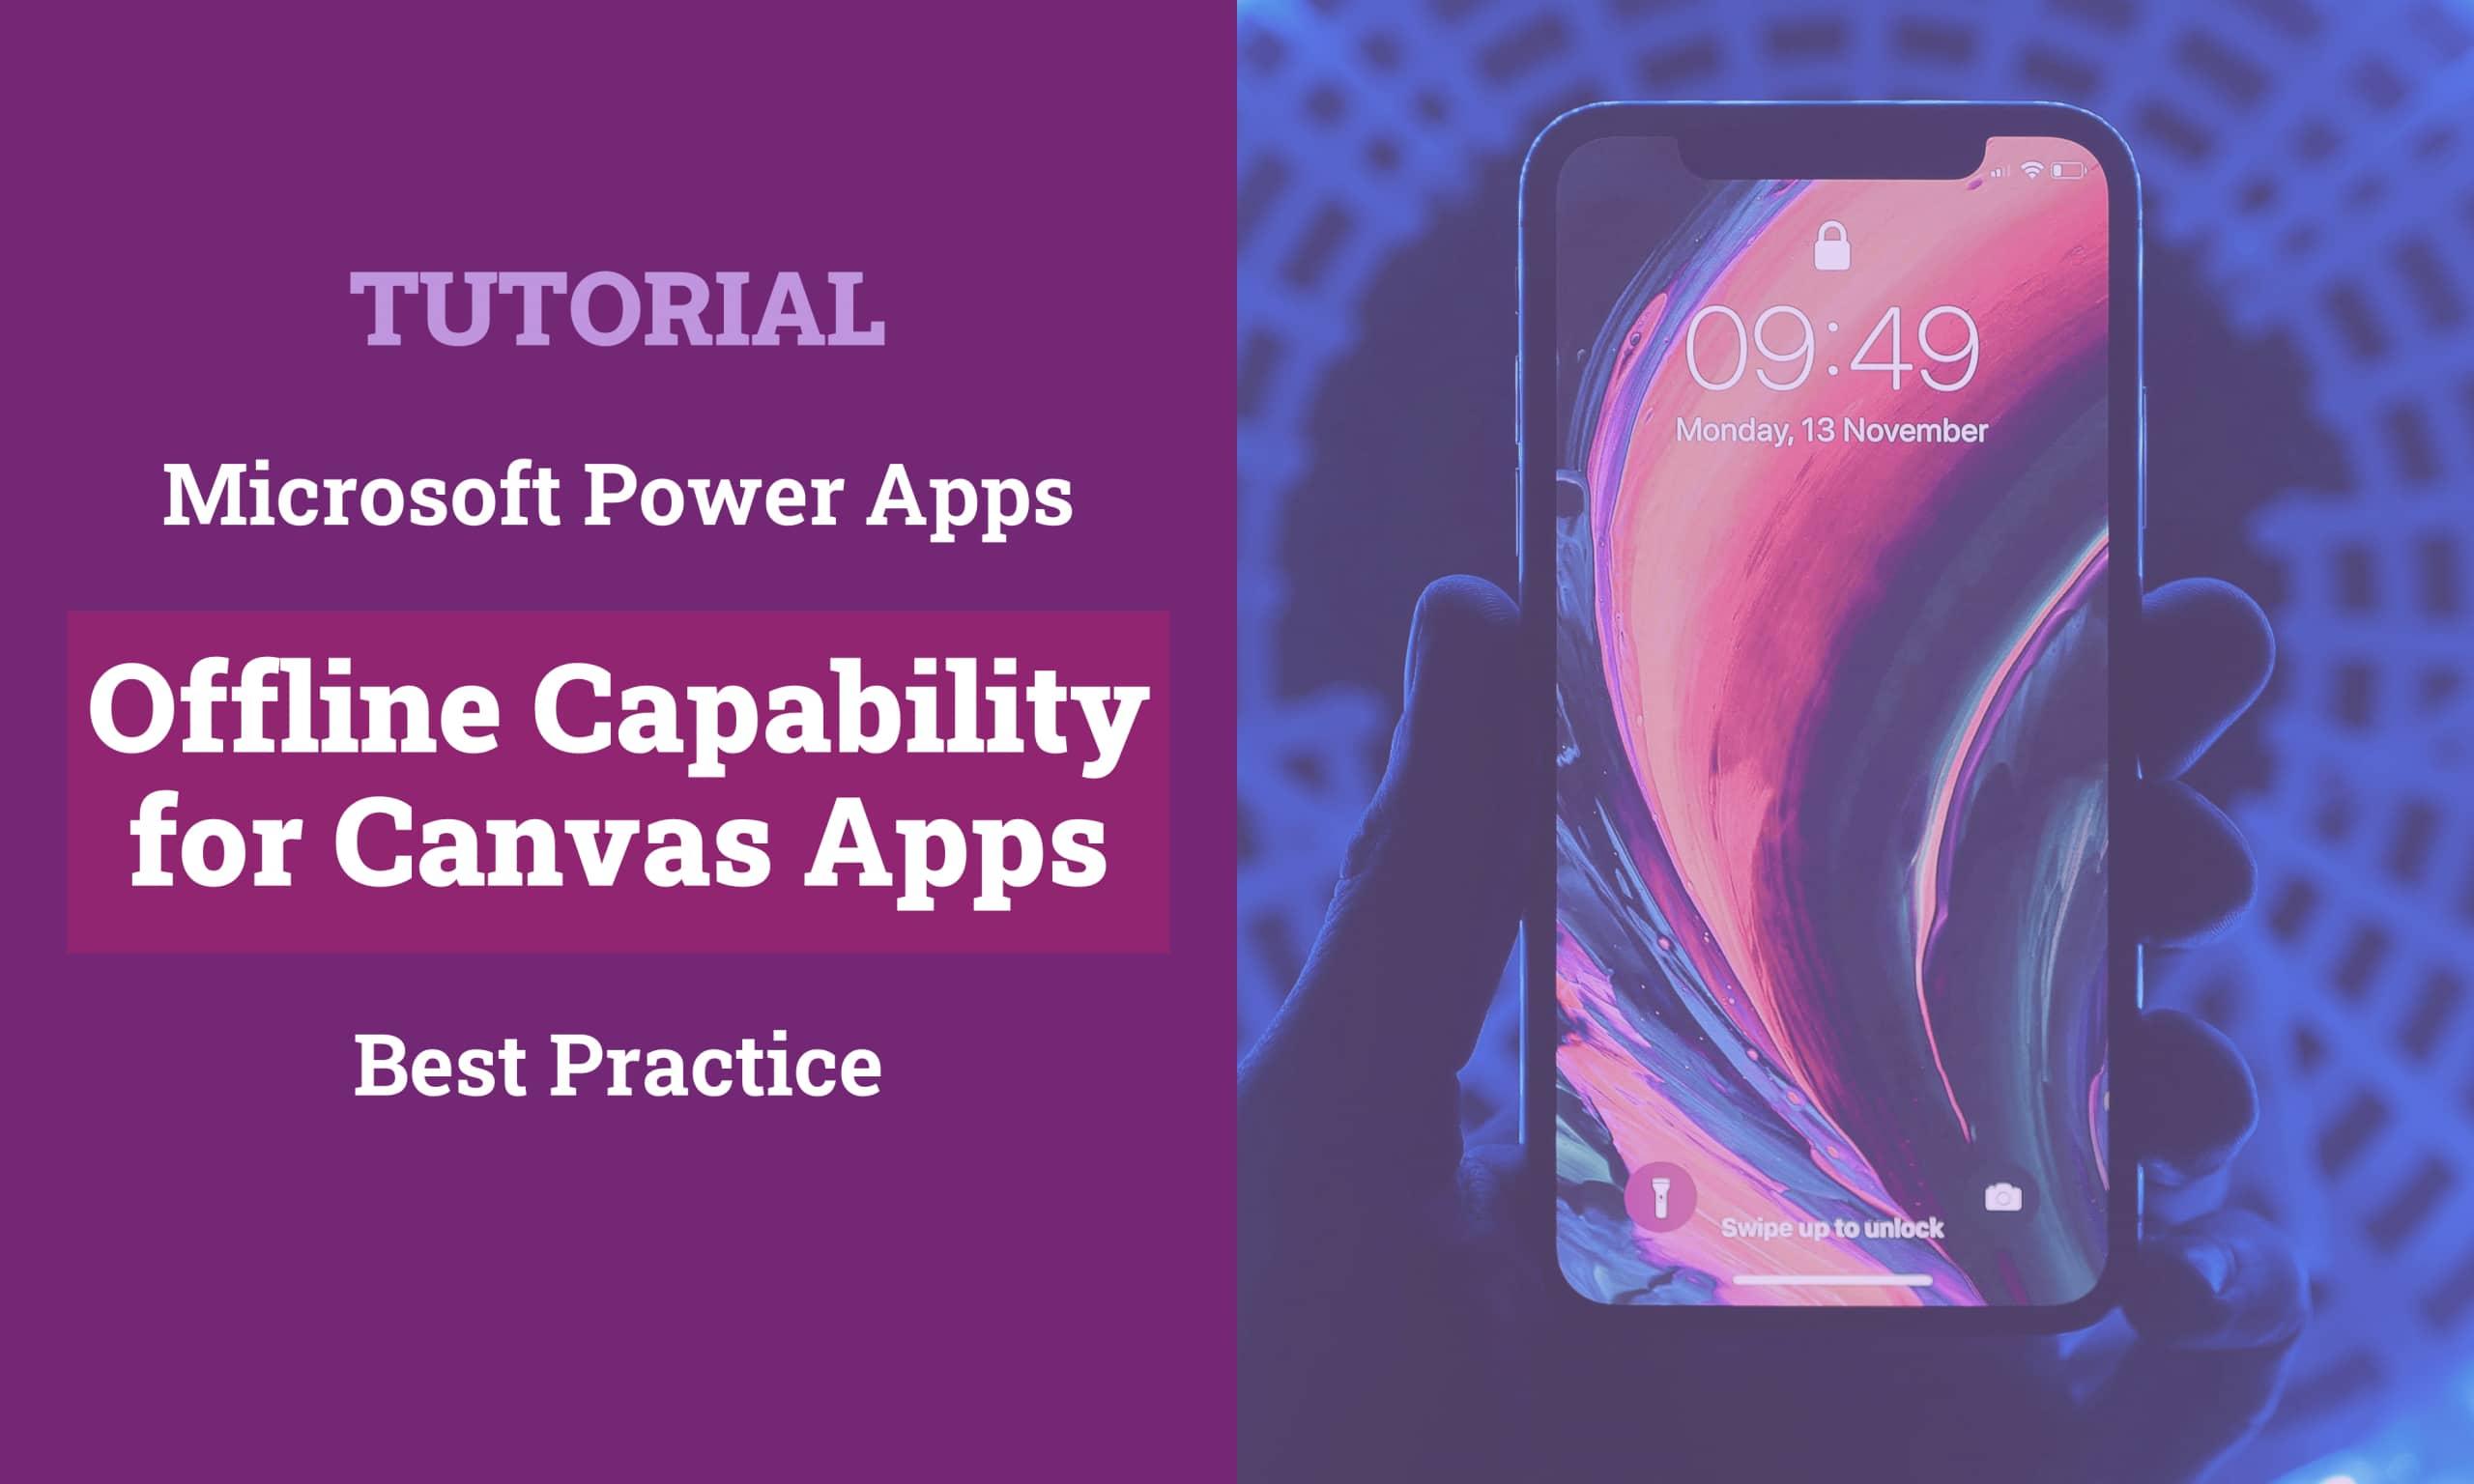 Power Apps Canvas Apps Offline Capability Titelbild scaled